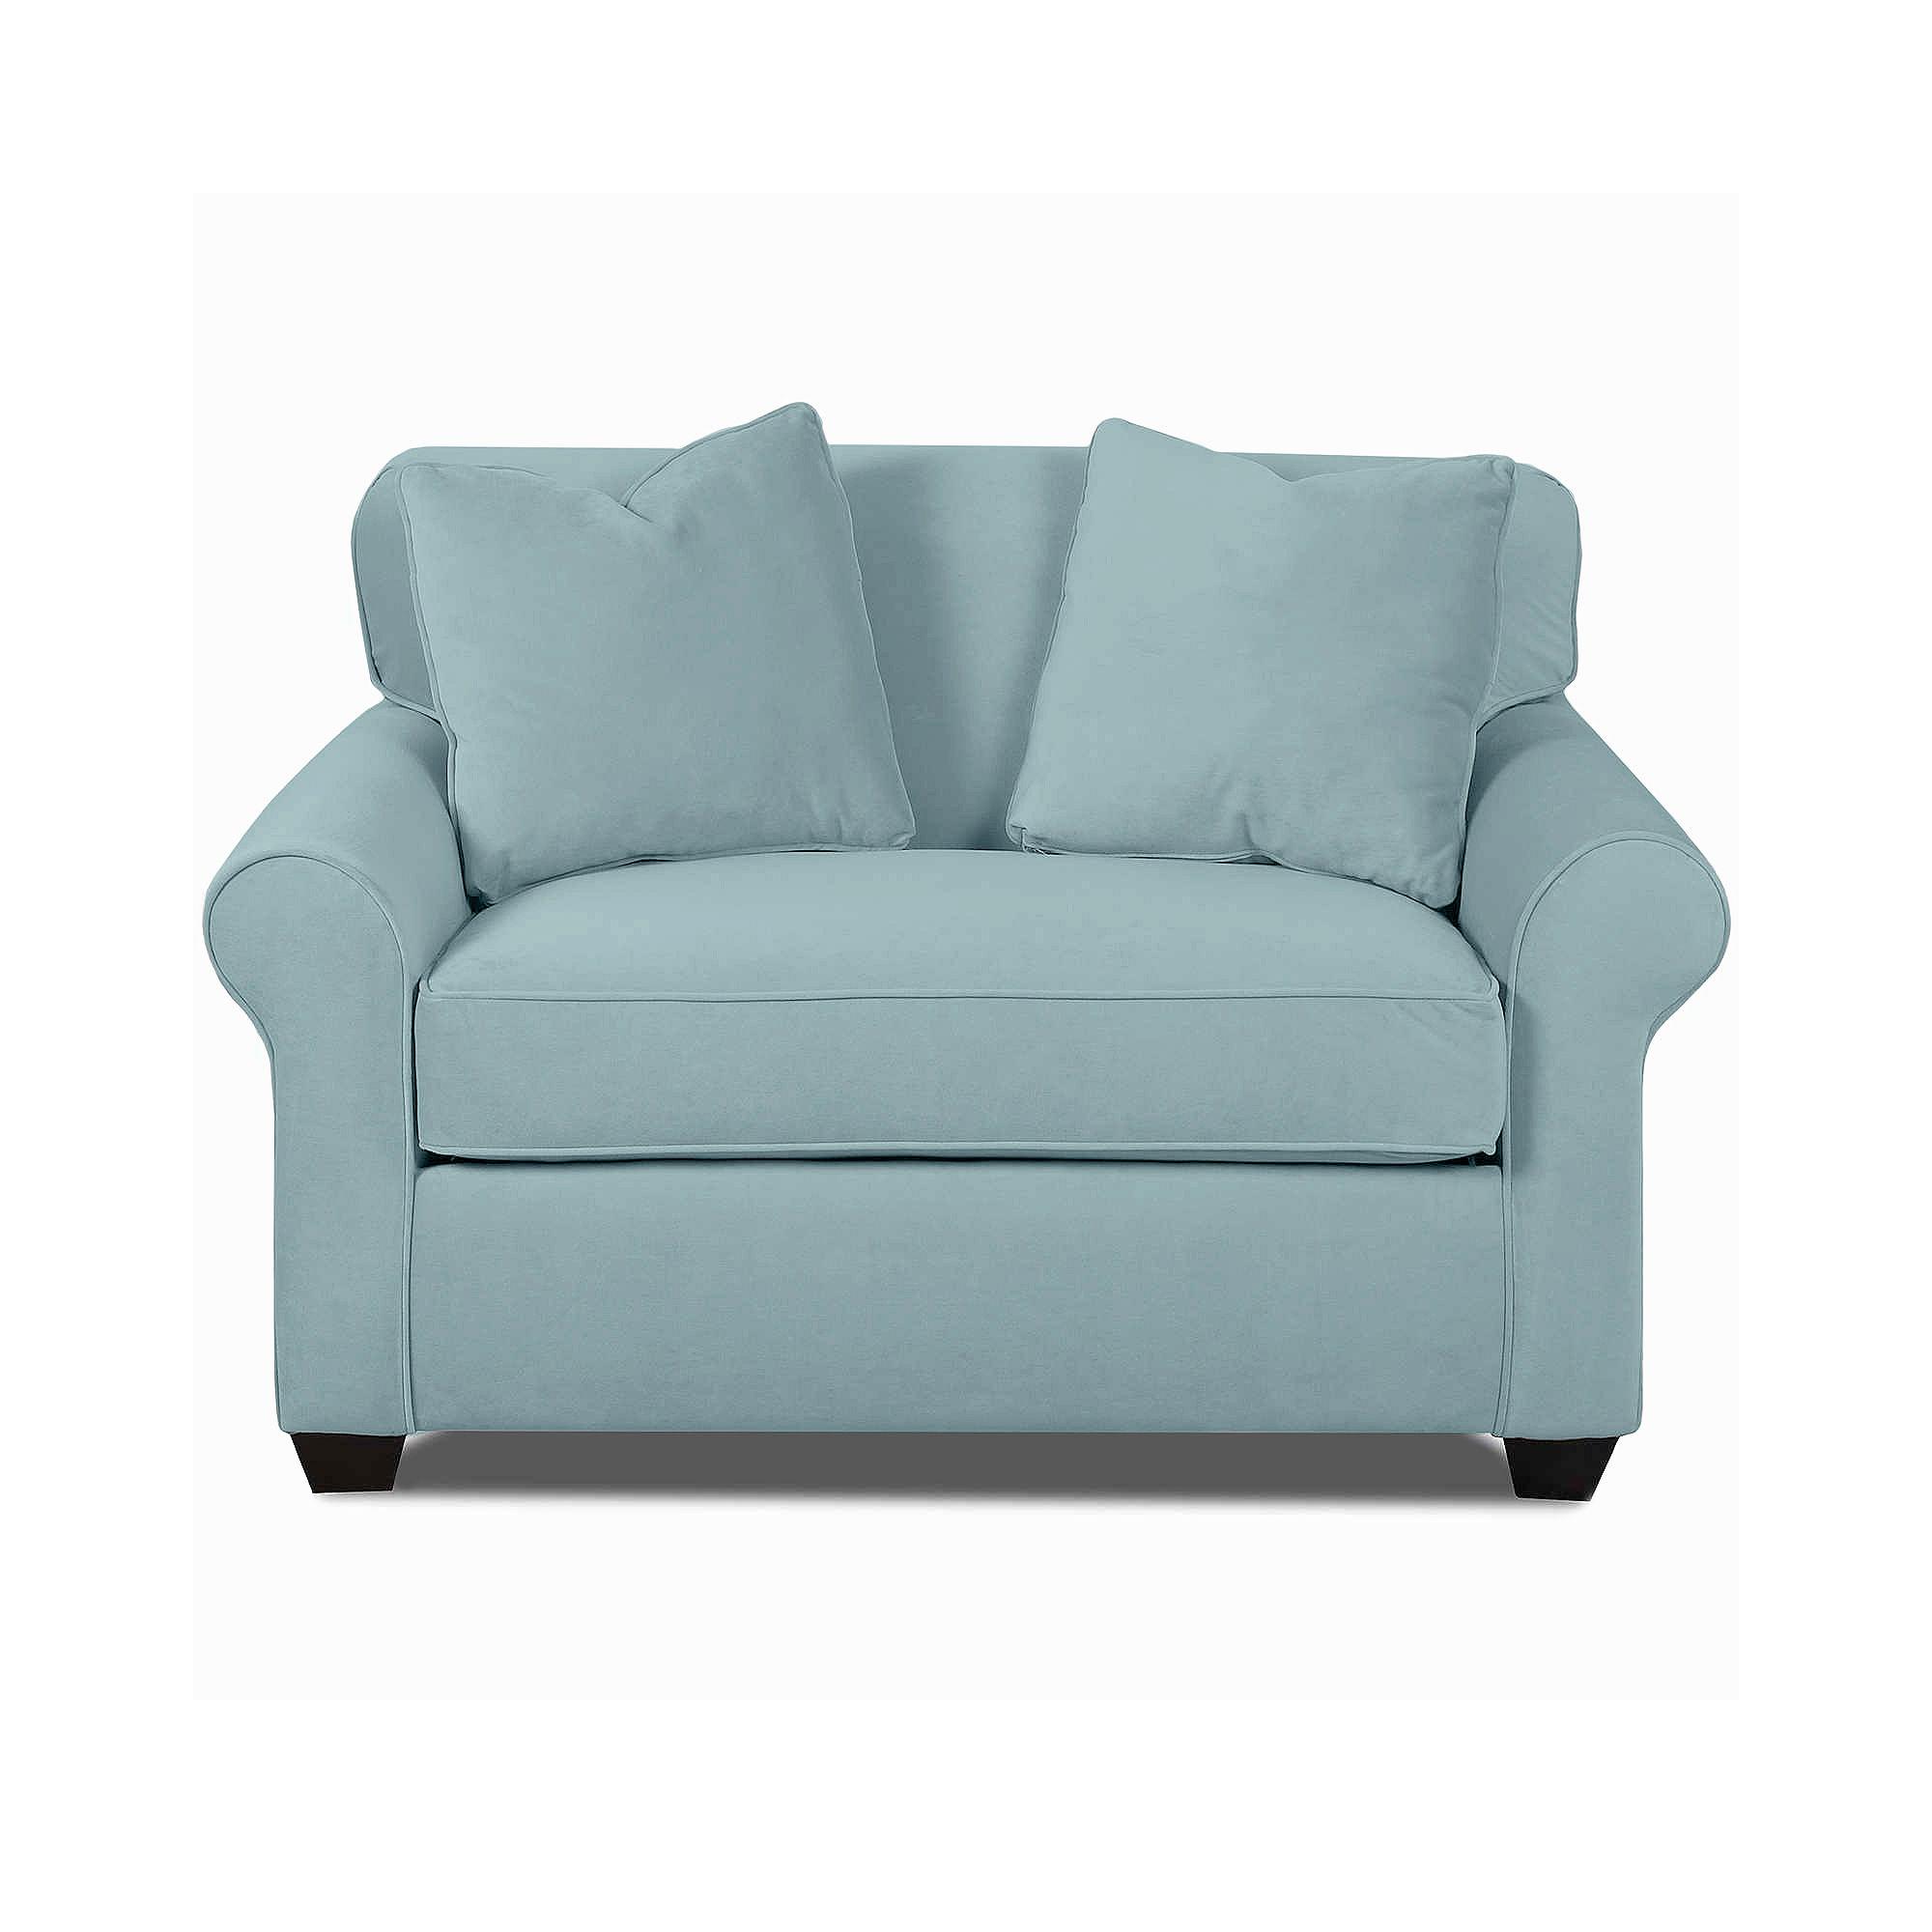 twin sleeper chair ikea do you need review of twin sleeper chair ikea